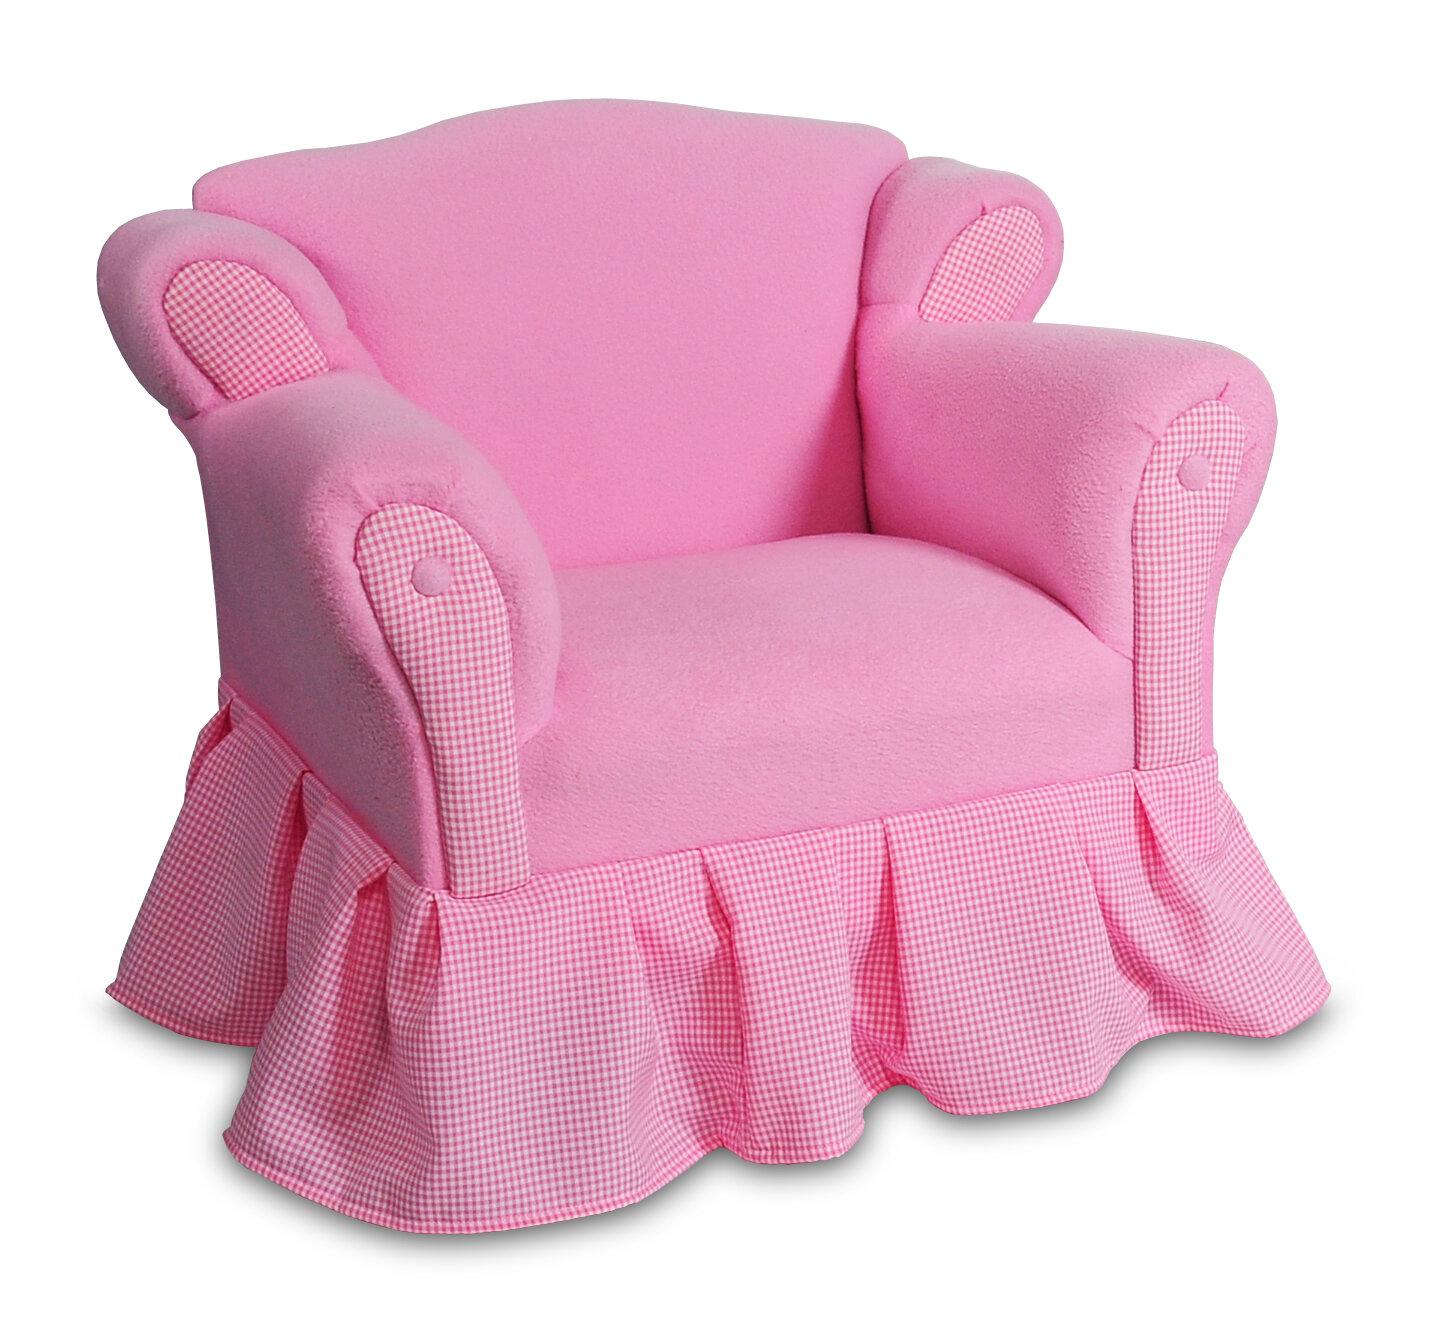 Delicieux Keet Princess Kids Cotton Club Chair U0026 Reviews | Wayfair